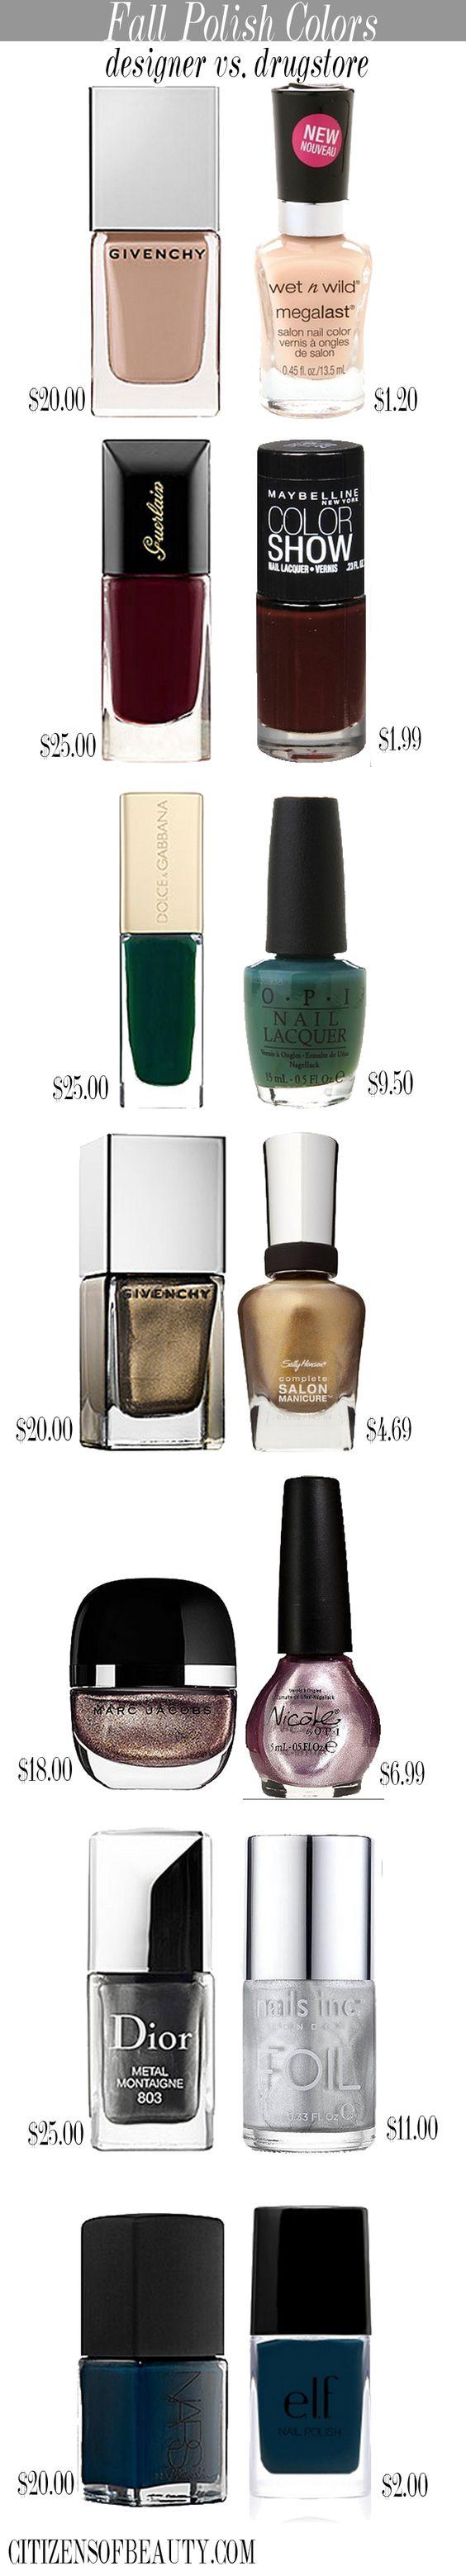 Drugstore vs. Designer: Fall Nail Polish Colors - Citizens of Beauty